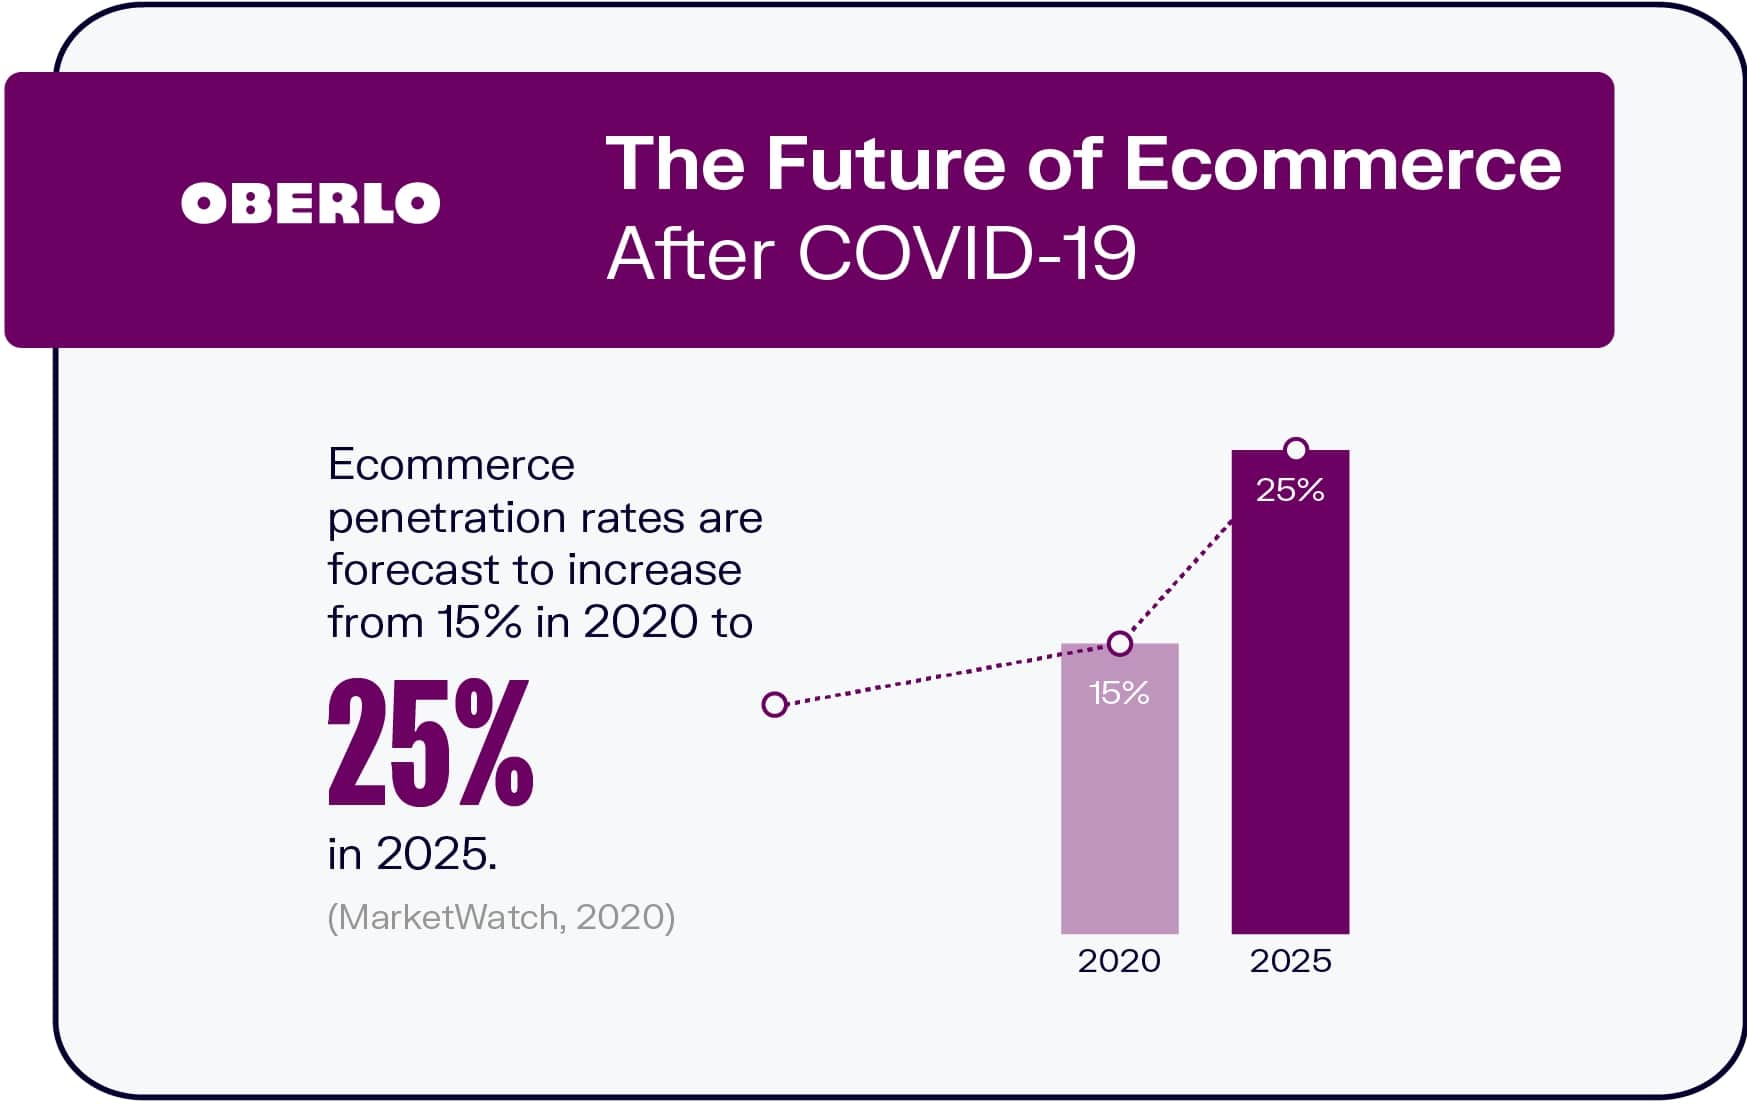 NOBKA 10 ECOMMERCE TRENDS THAT YOU NEED TO KNOW IN 2020 3 بررسی ده روند جذاب تجارت الکترونیک در سال 2020 – بخش اول